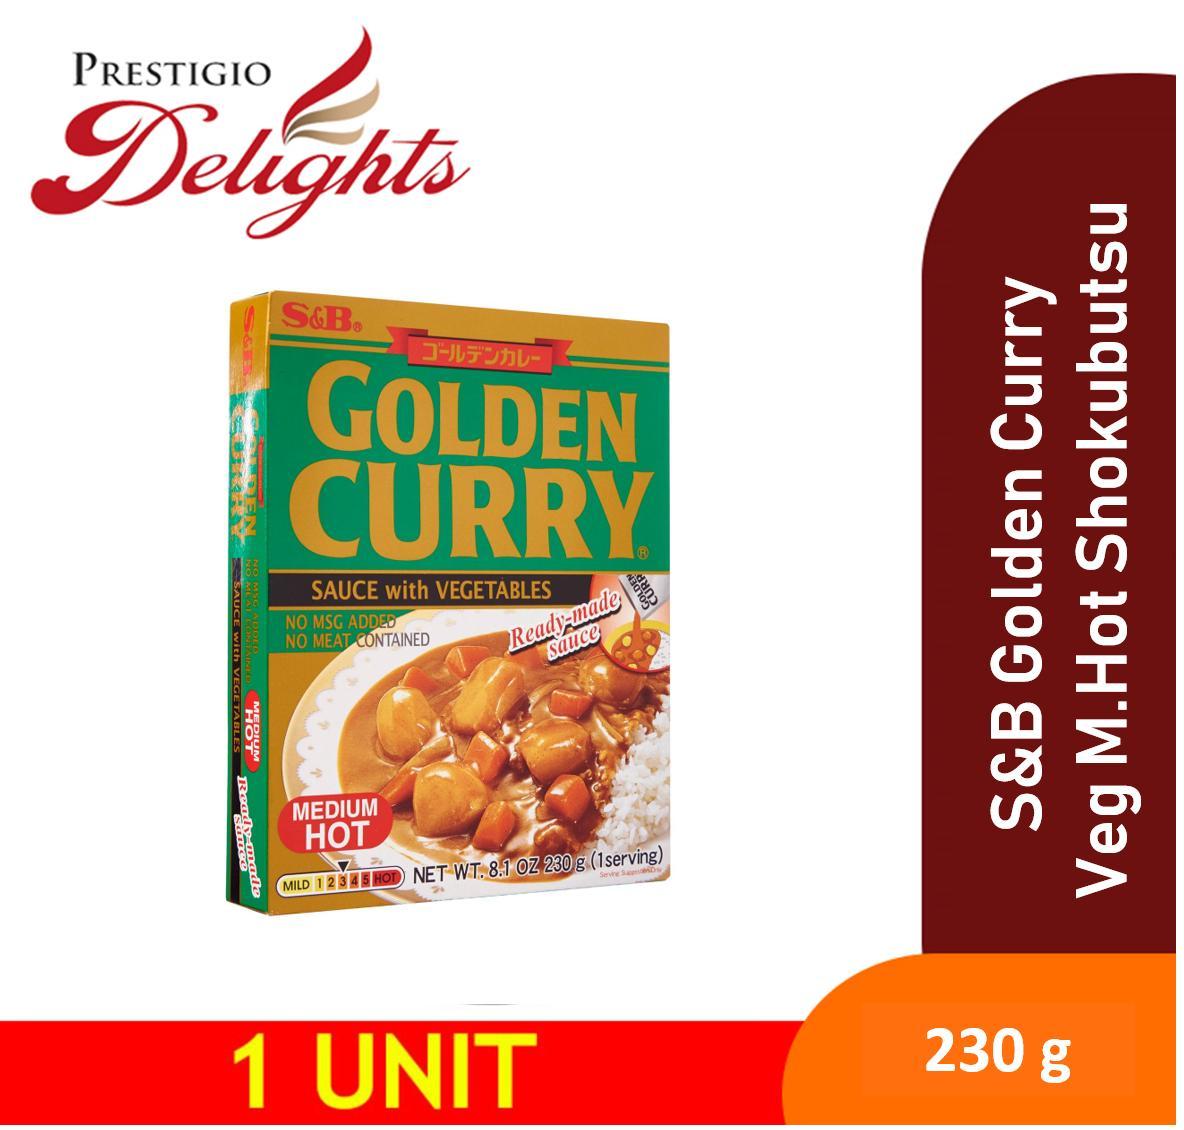 S&b Golden Curry With Vegetables Medium Hot Shokubutsu 230g By Prestigio Delights.